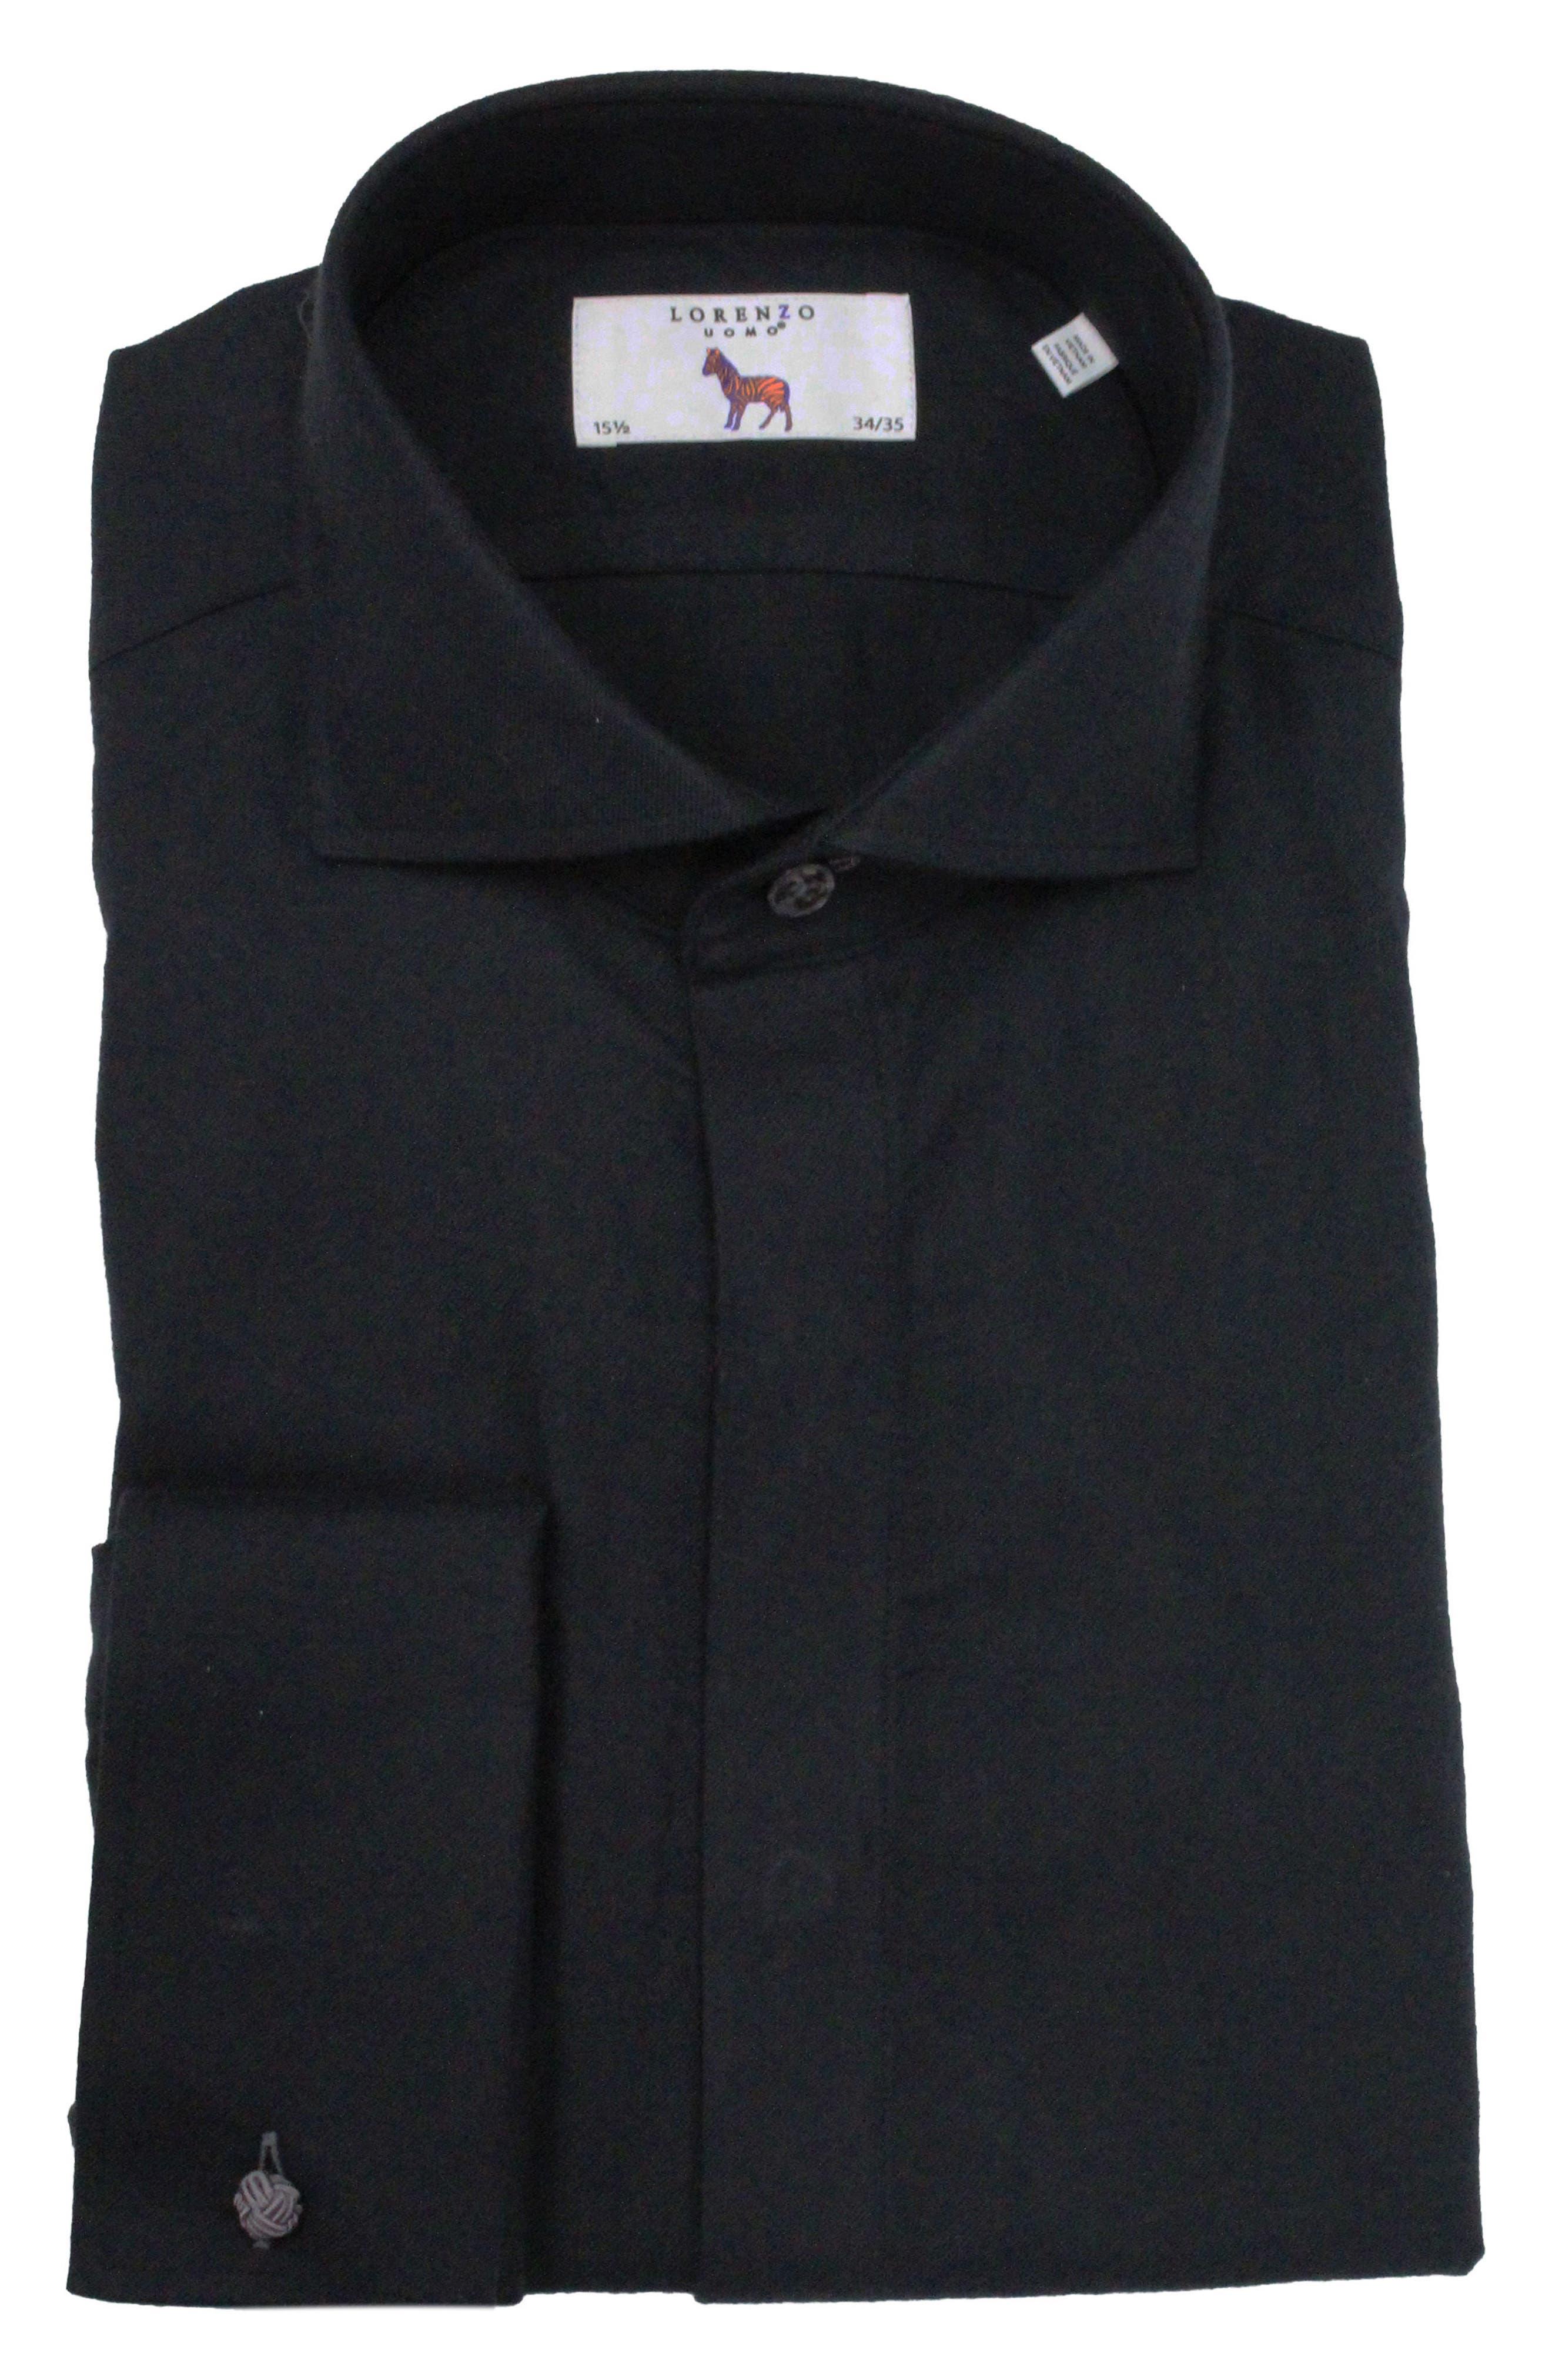 Alternate Image 1 Selected - Lorenzo Uomo Trim Fit Tuxedo Shirt